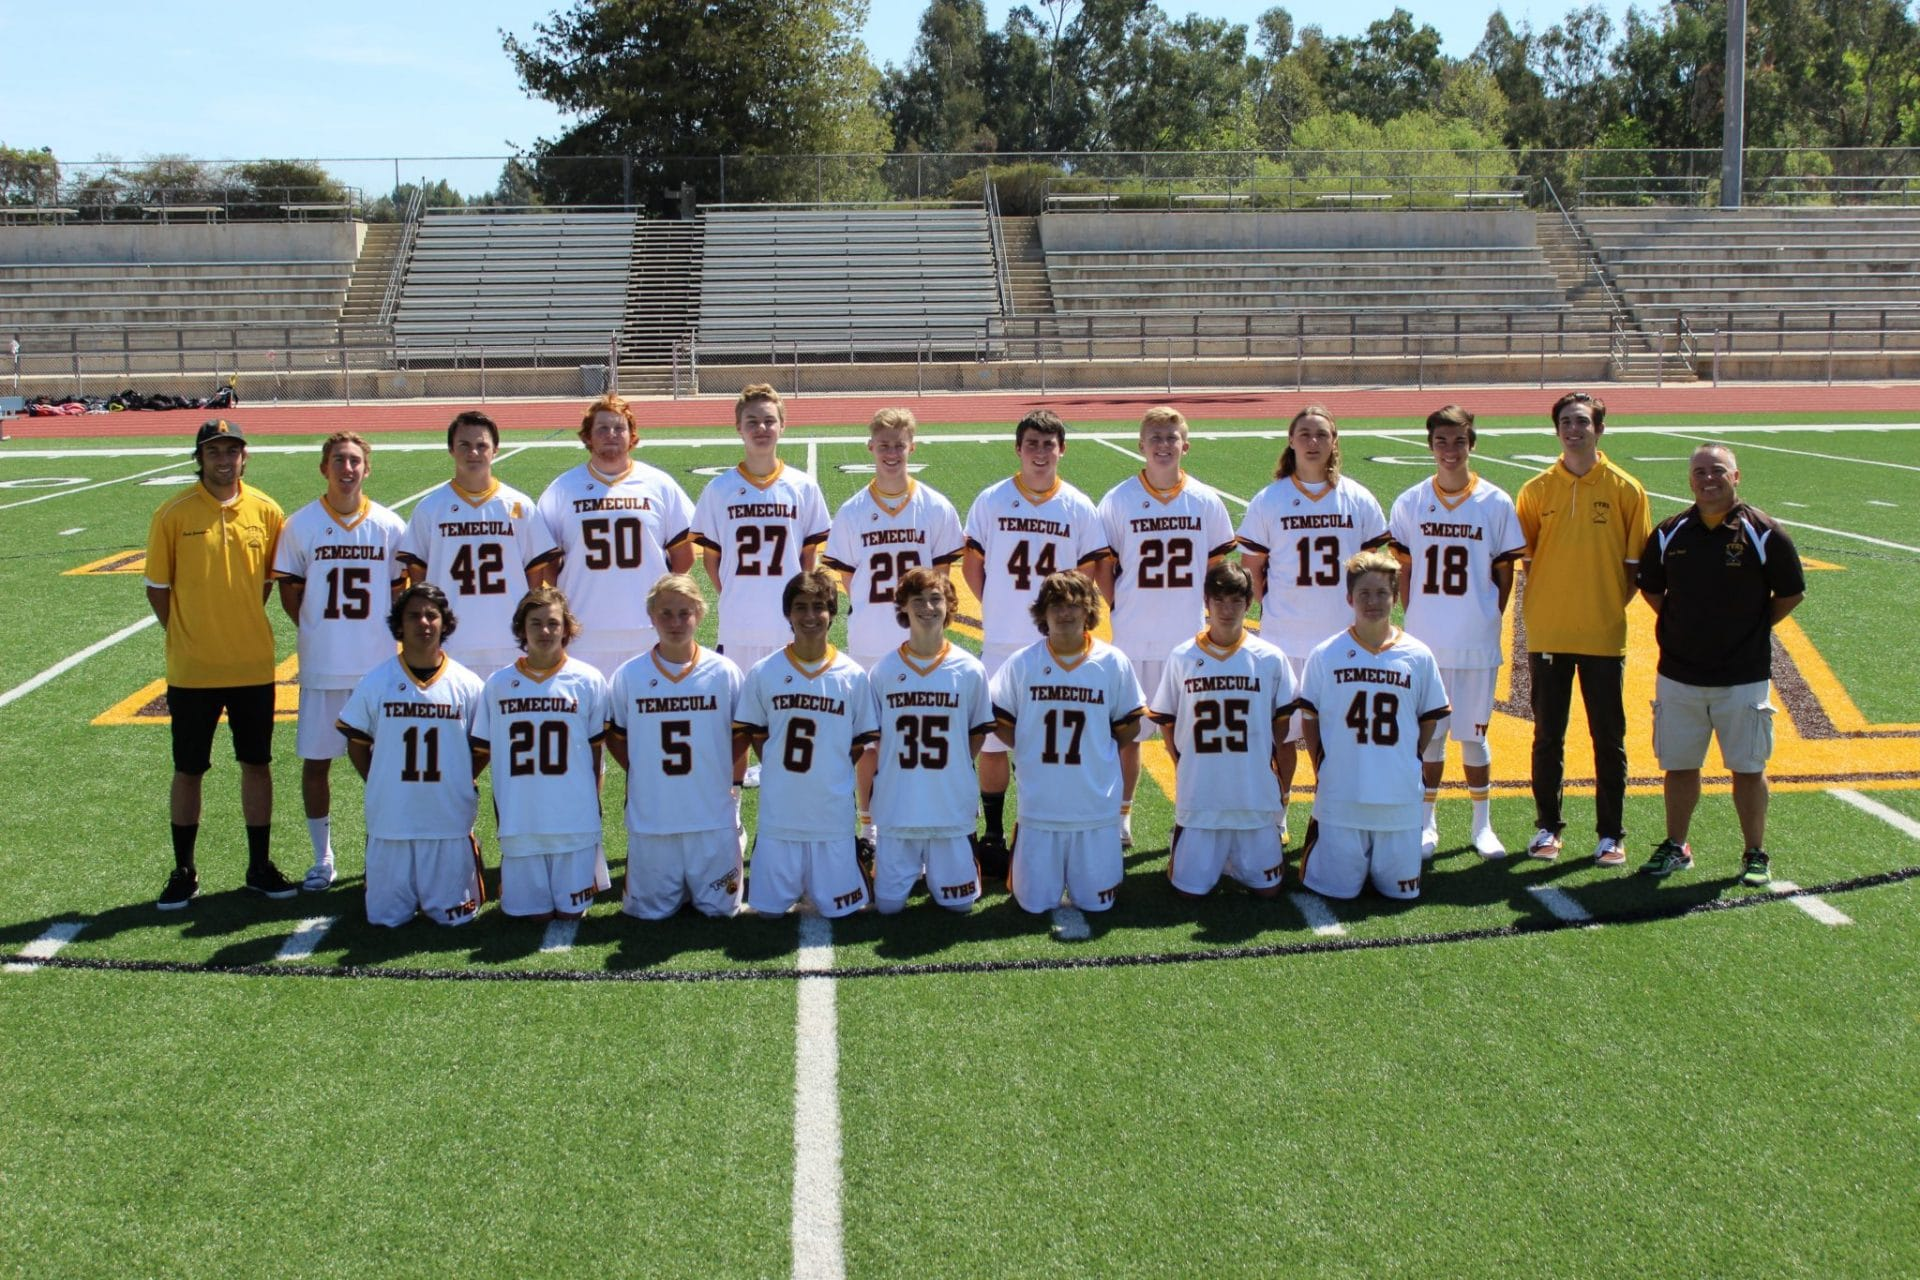 Temecula Valley Boys Lacrosse